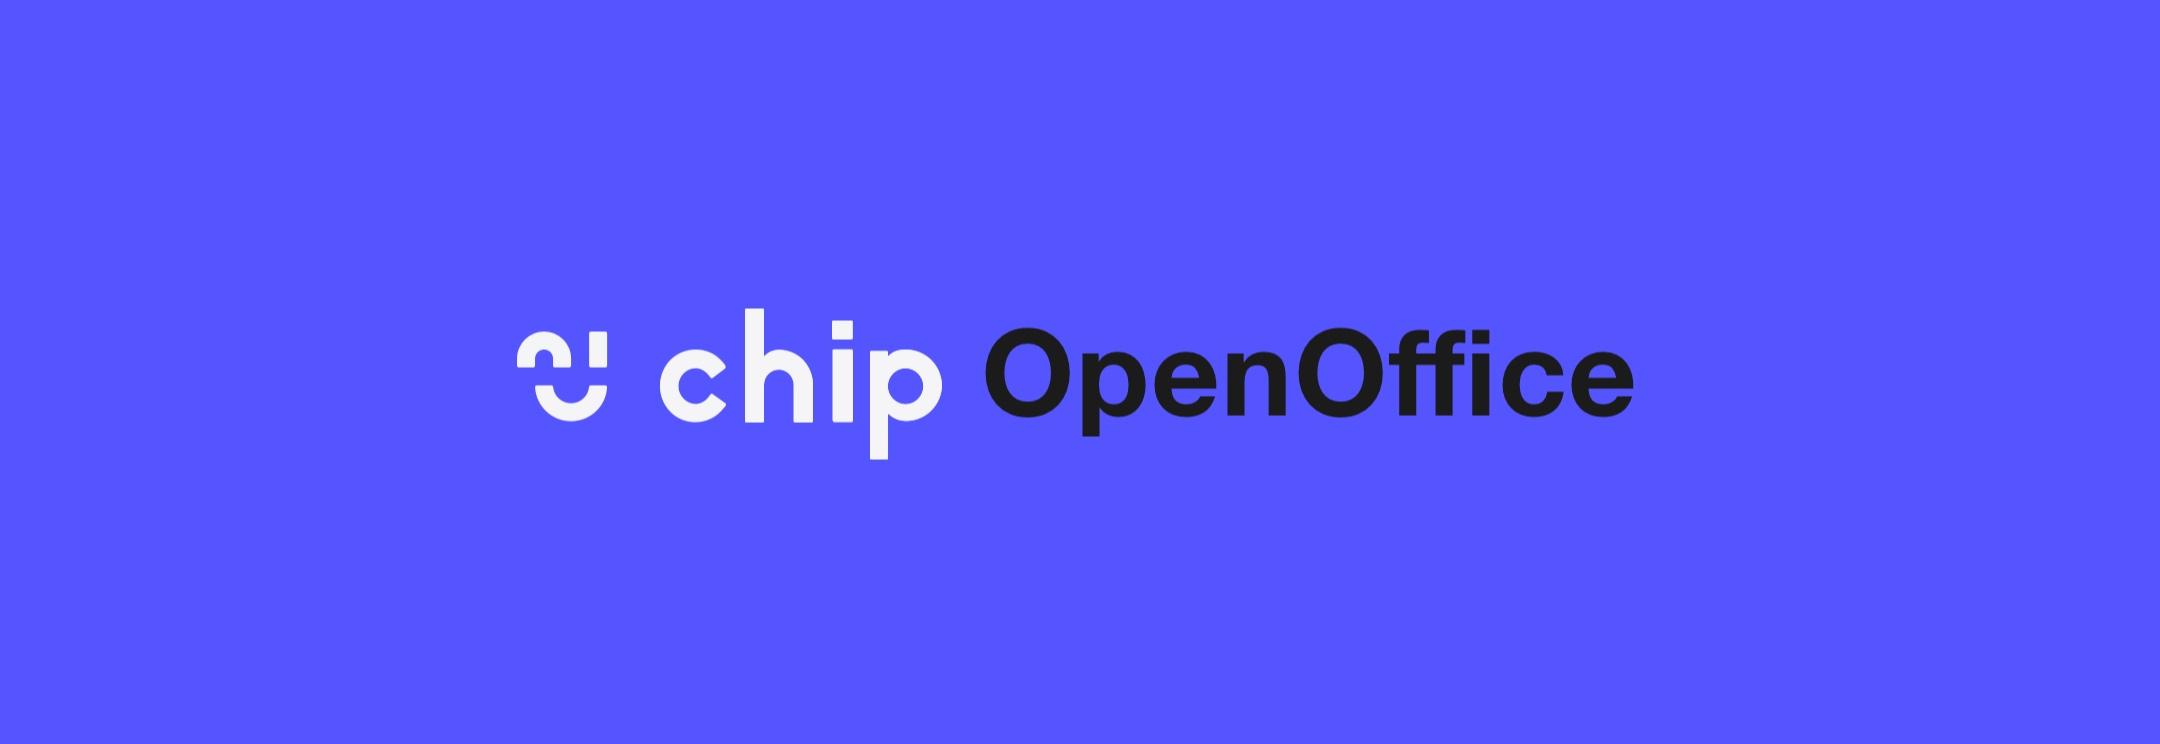 C_OpenOffice_Banner.jpg